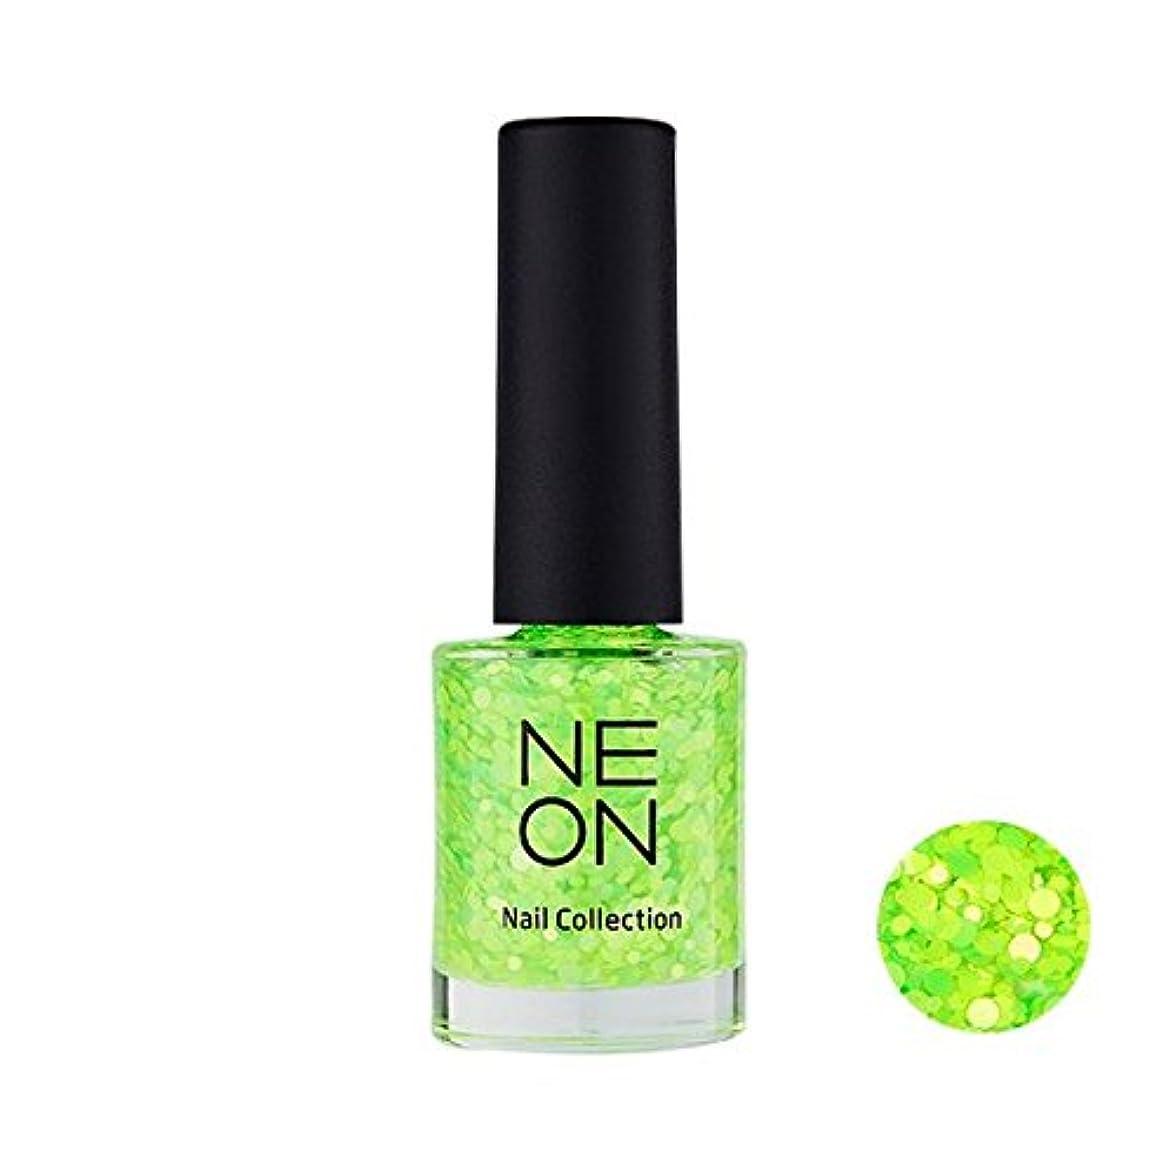 It'S SKIN Neon nail collection [04 Neon Glitter green] イッツスキン ネオンネイルコレクション [04 ネオン グリッター グリーン] [並行輸入品]